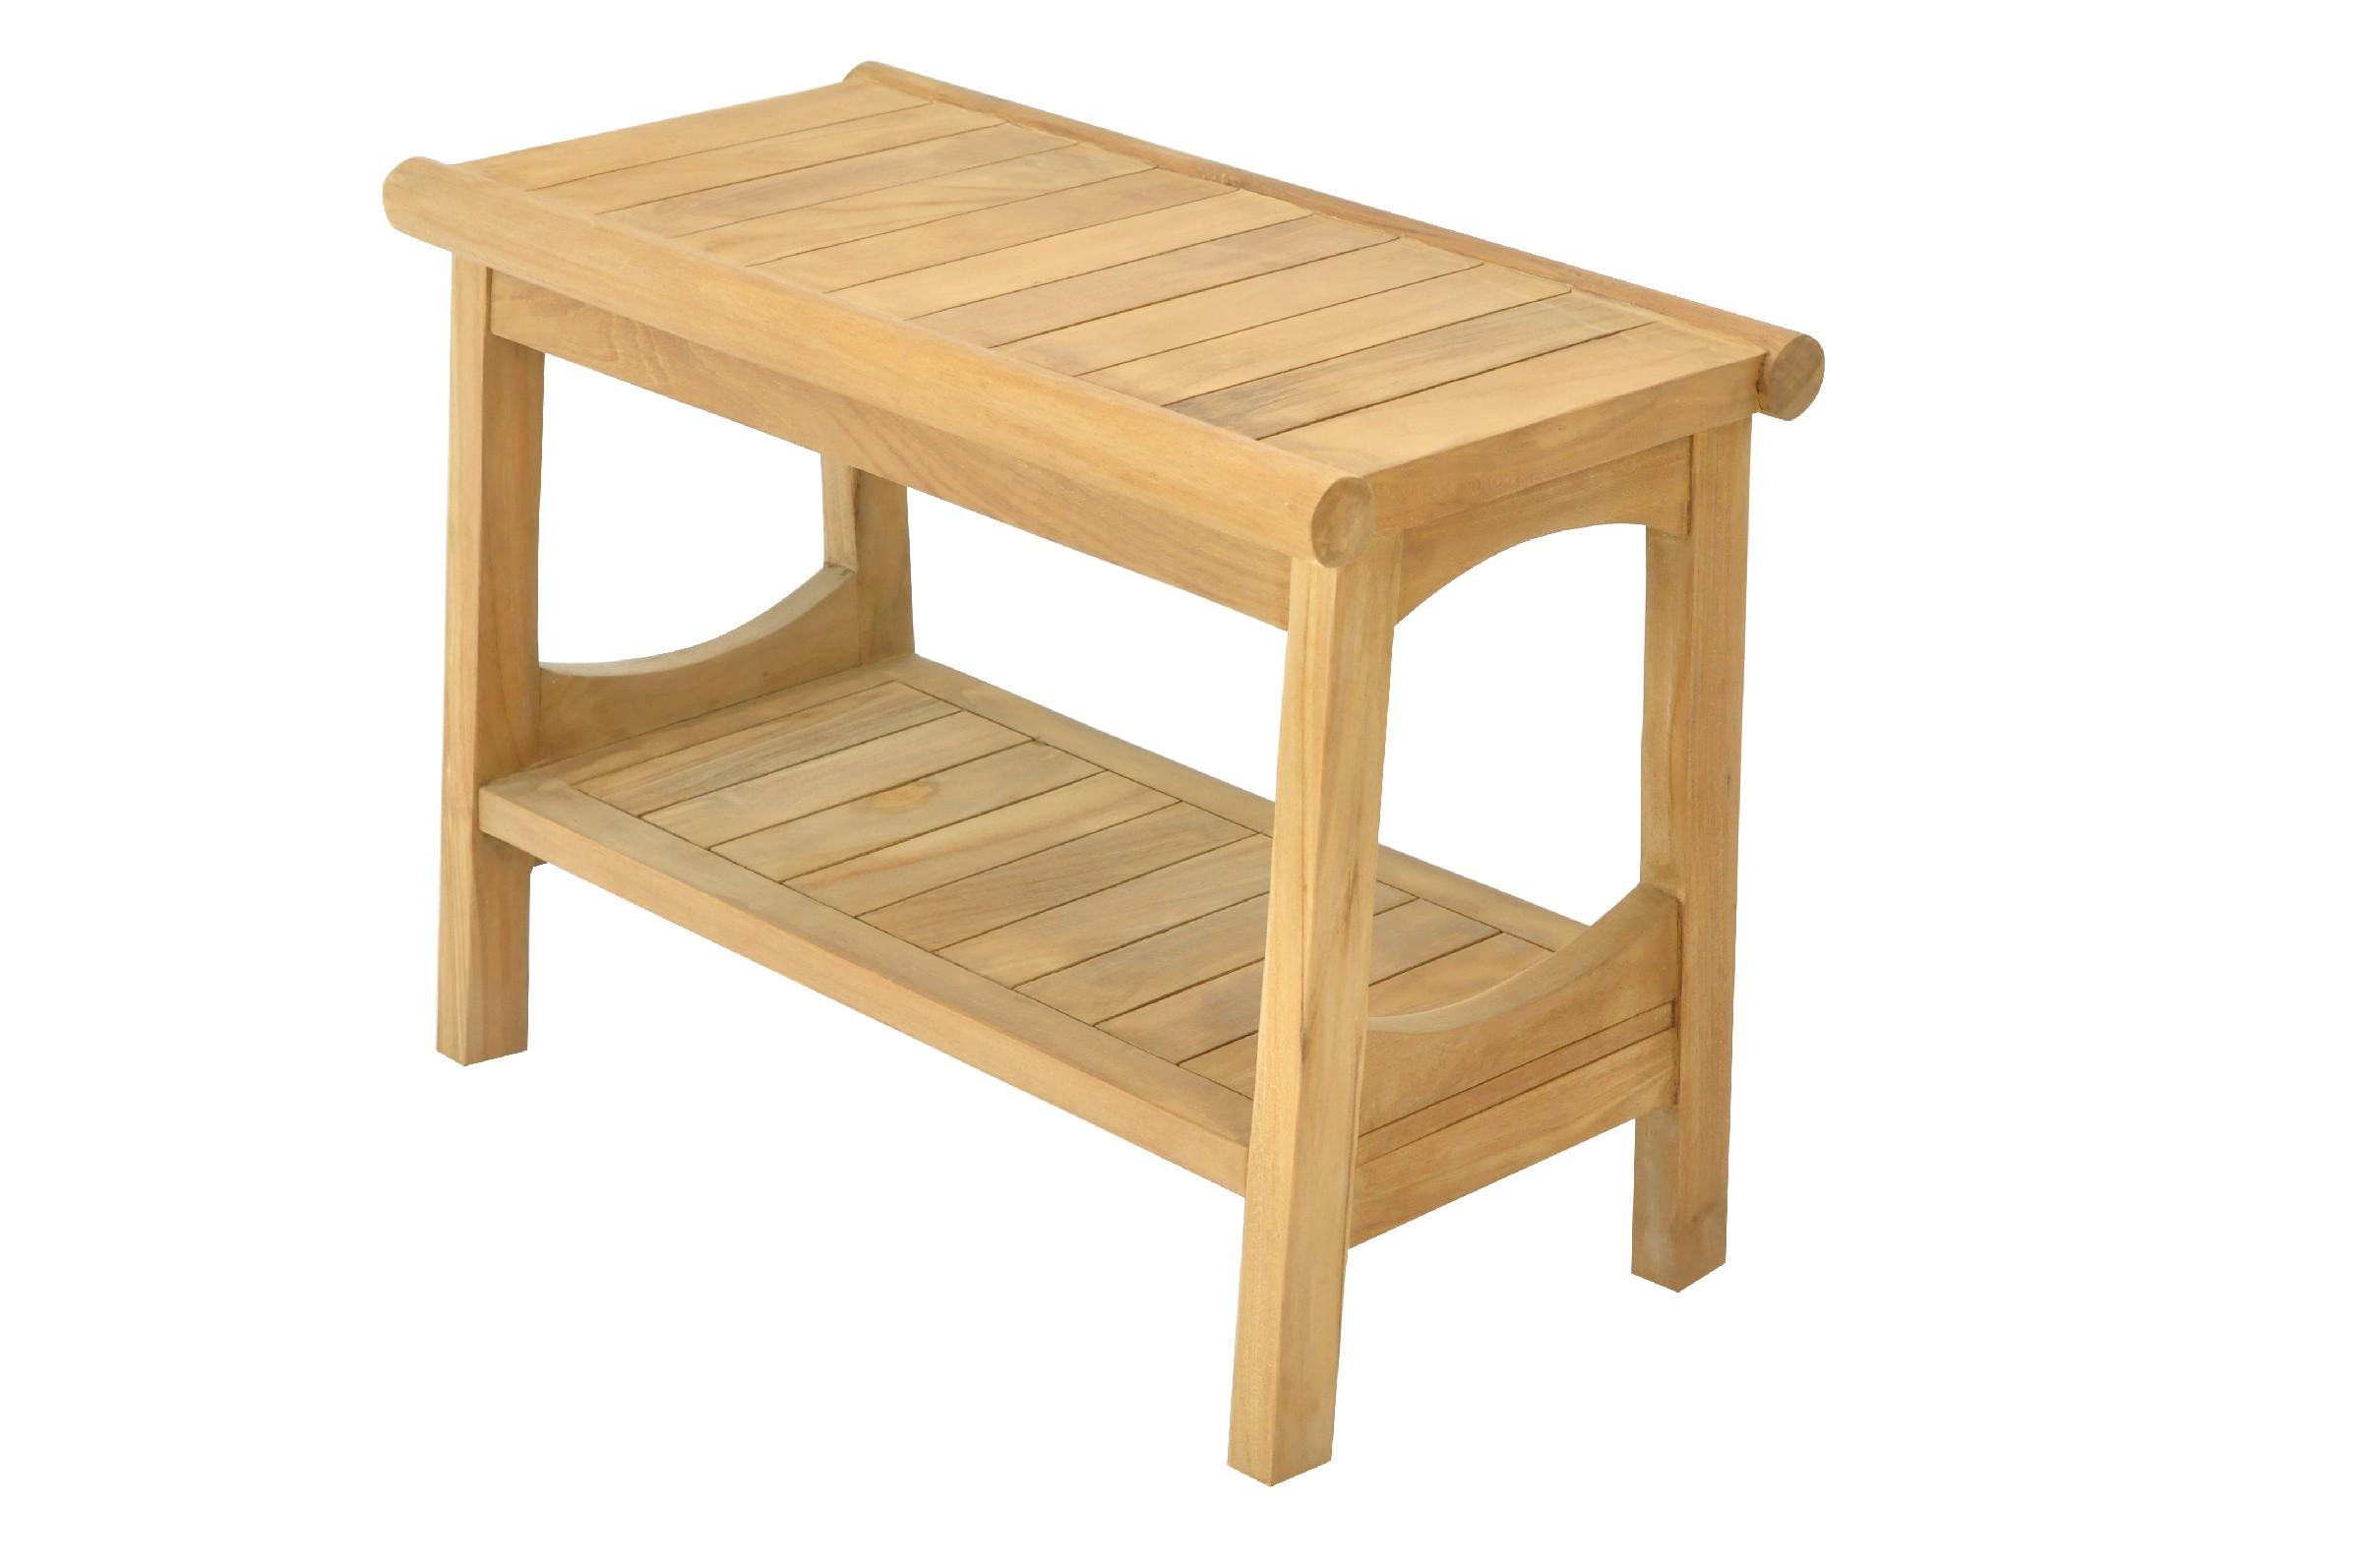 Miraculous Details About Grade A Teak Wood Perth Shower Seat 24 Stool Bench Outdoor Patio Uwap Interior Chair Design Uwaporg